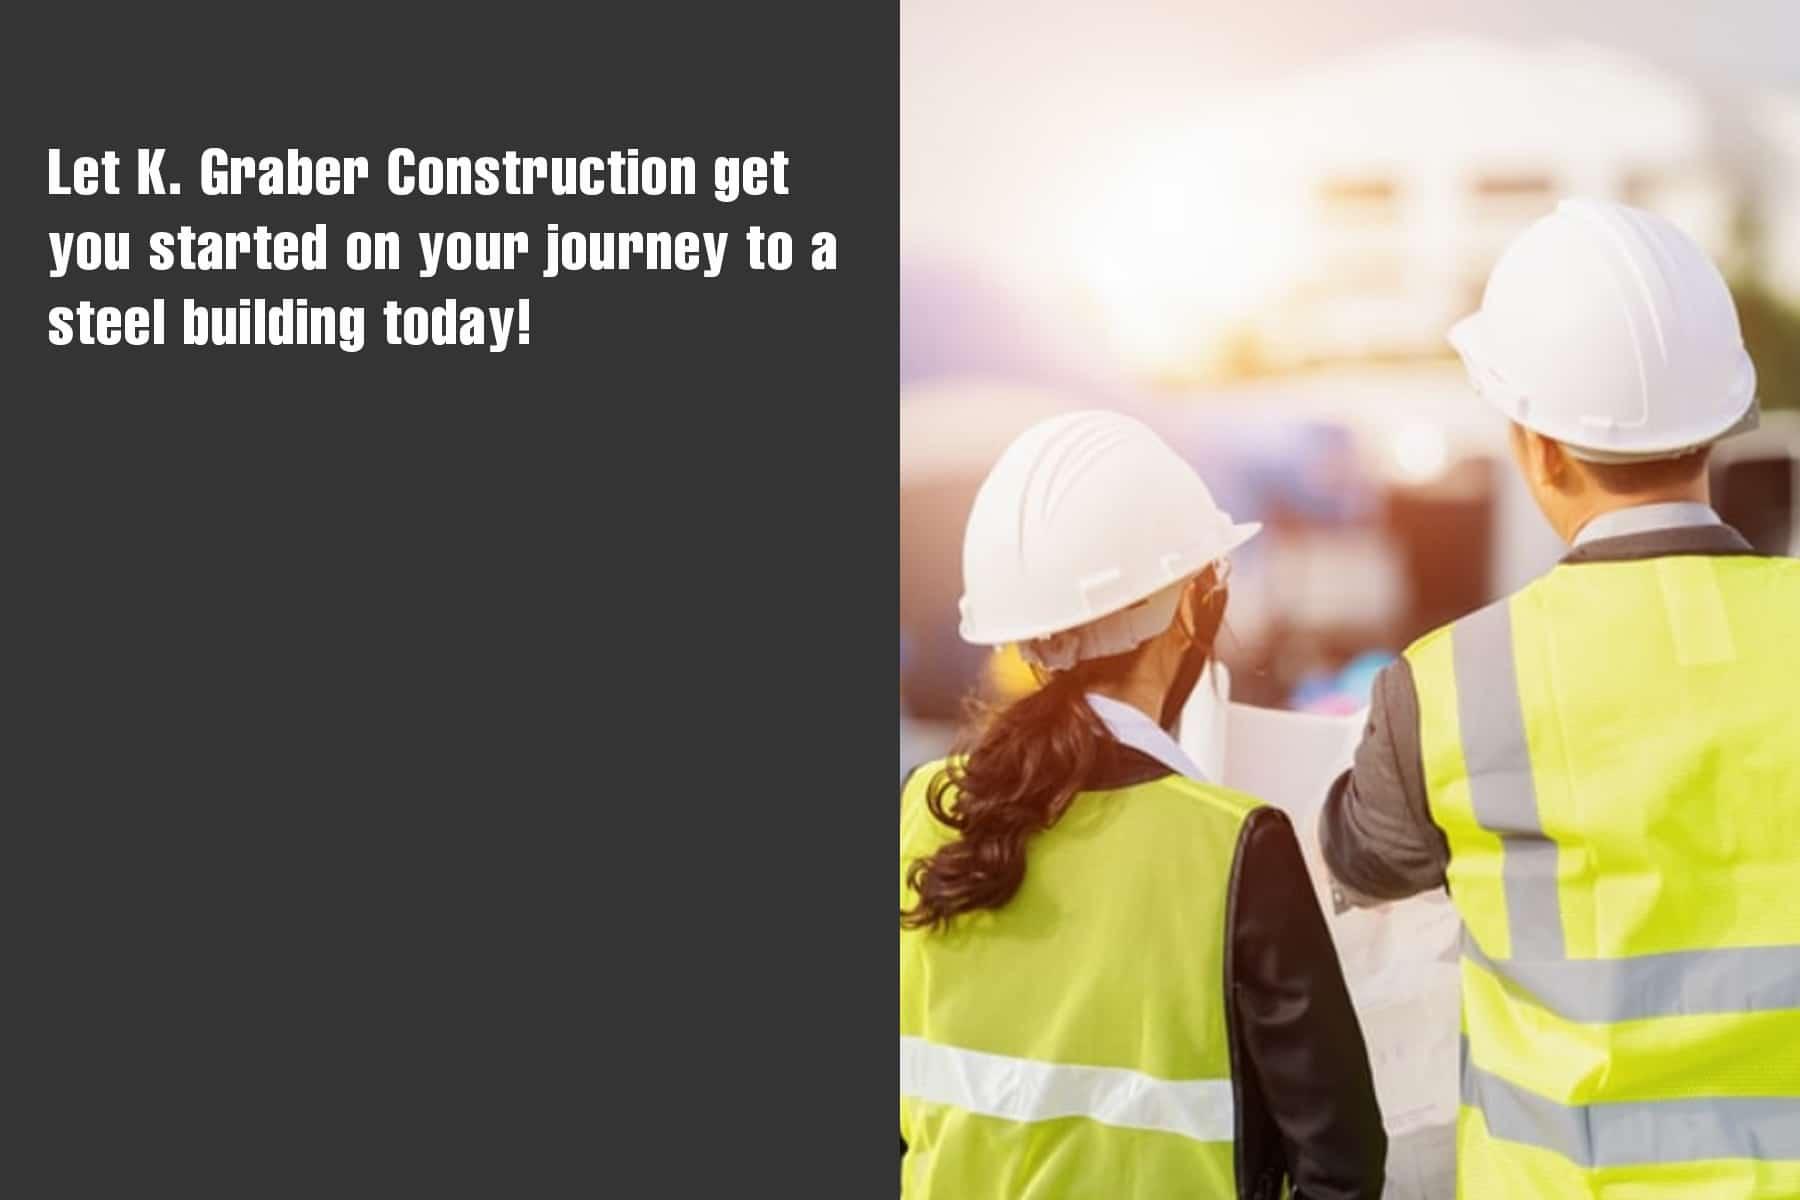 K Graber Constructions is a steel building contractor